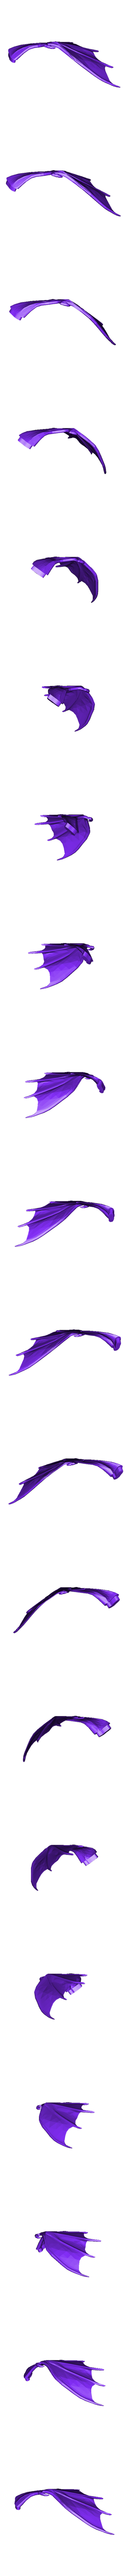 Red_Dragon_Updated_Left_Wing.stl Download free STL file Dragon Sculpture • 3D printing model, knadityas92